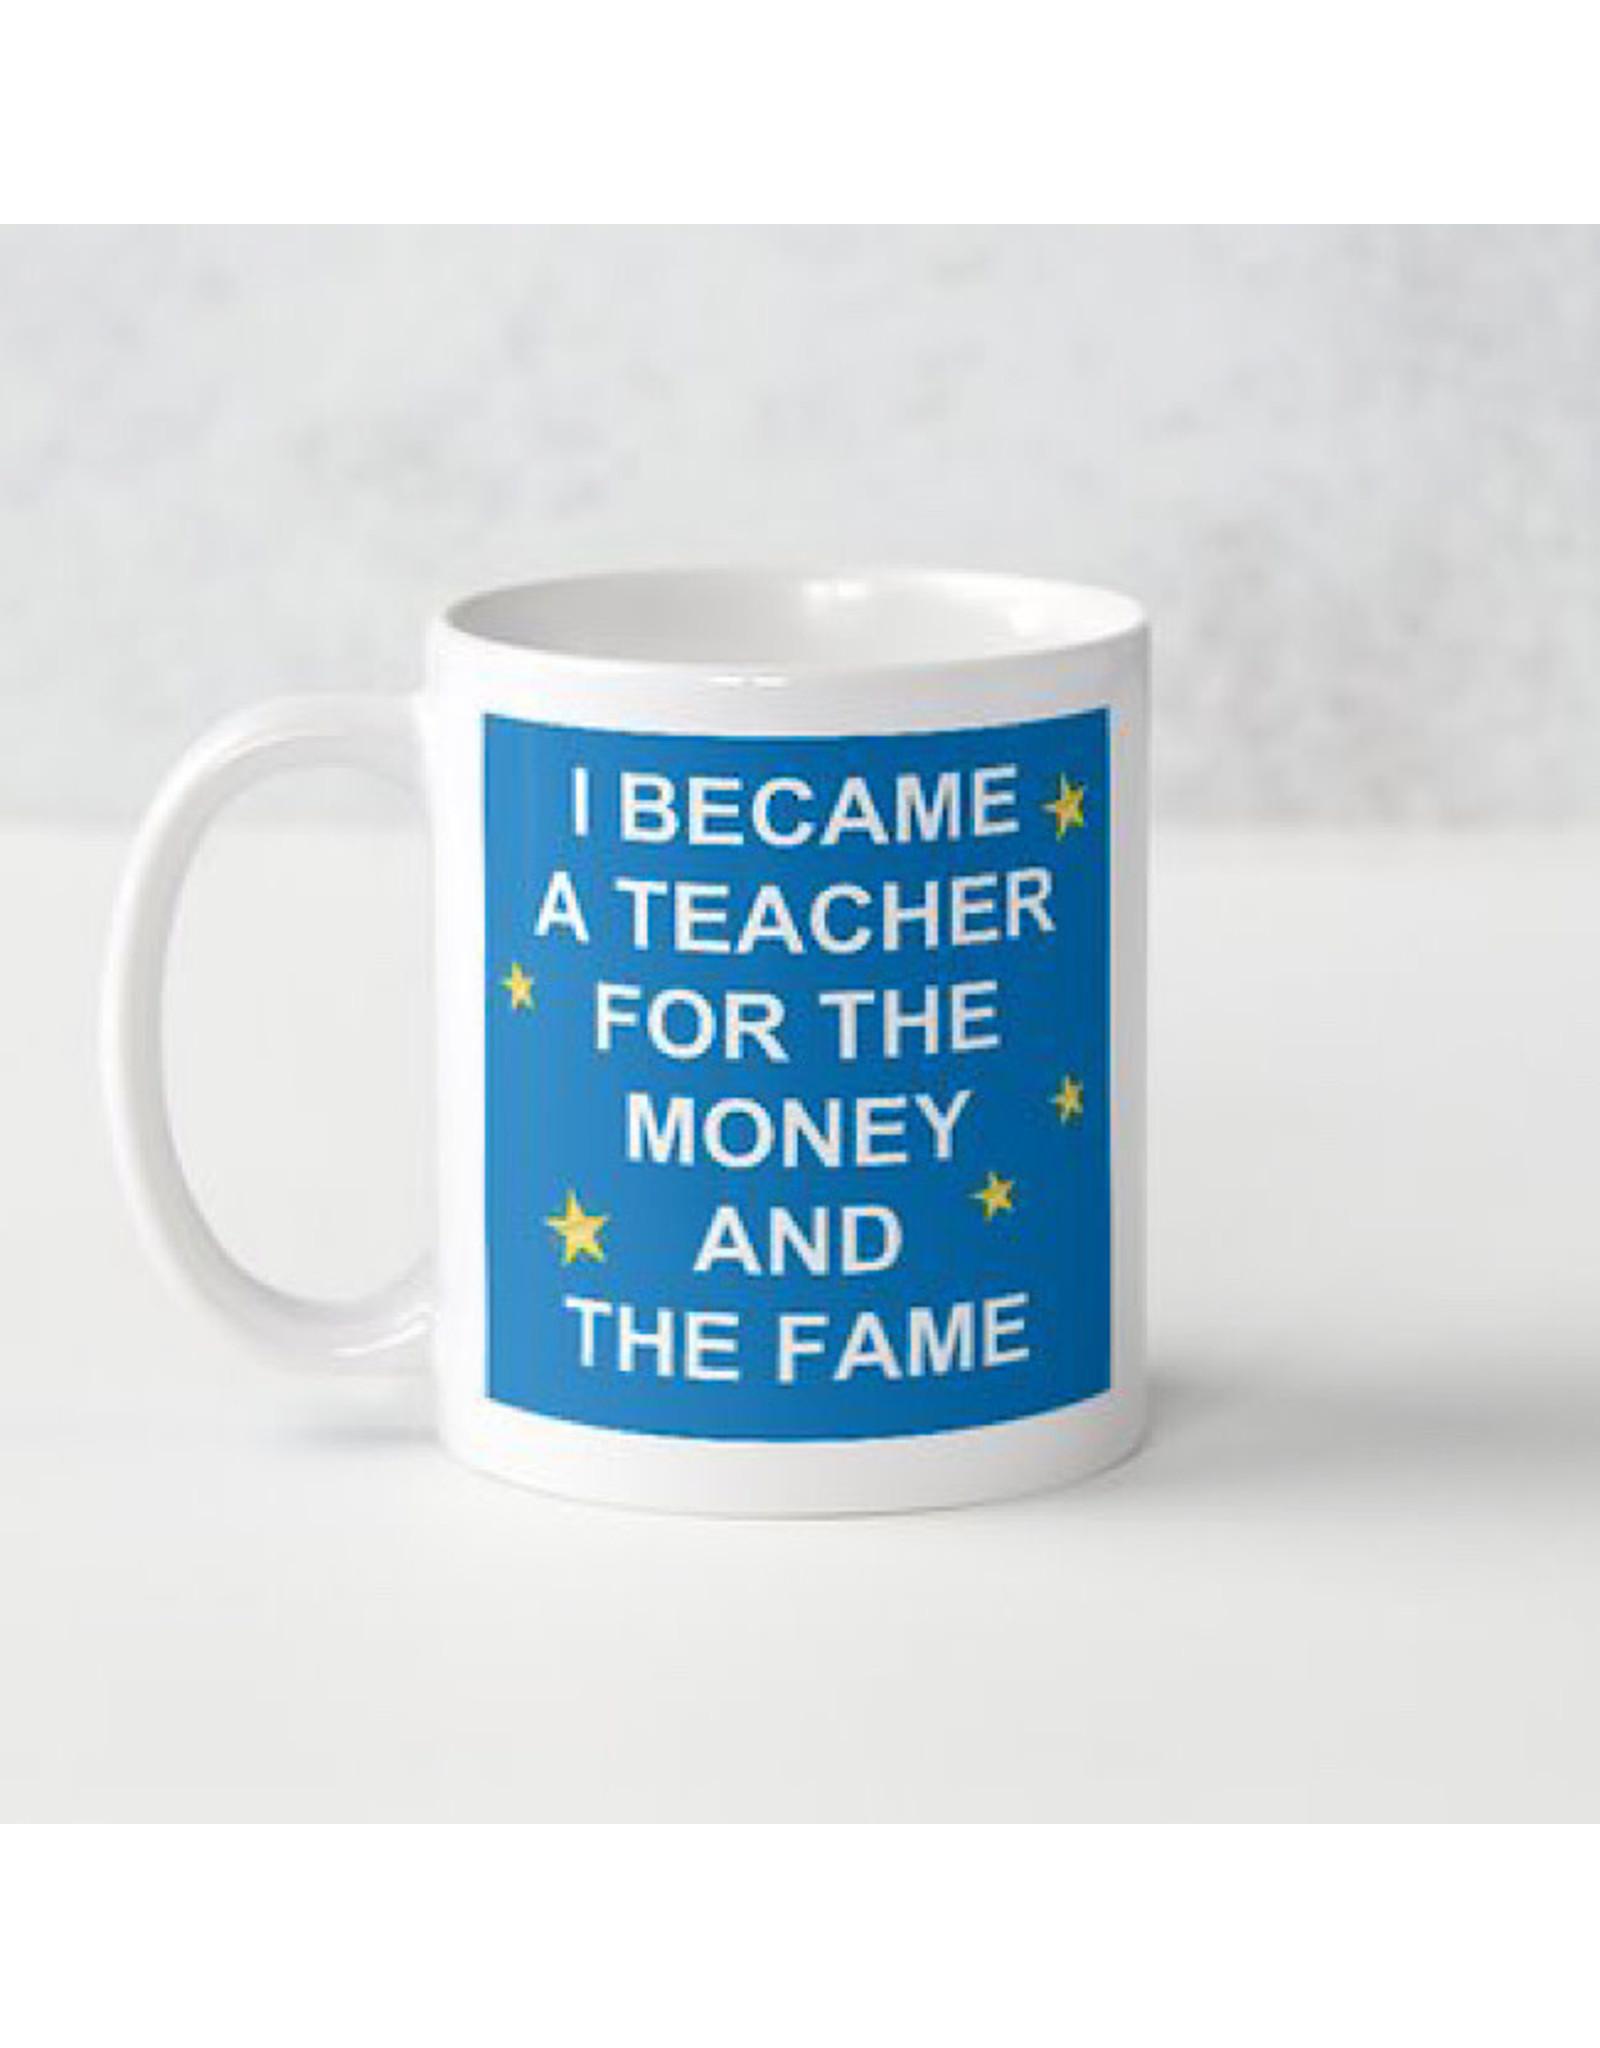 Mug - I Became A Teacher For The Money & Fame - Goodest Teacher